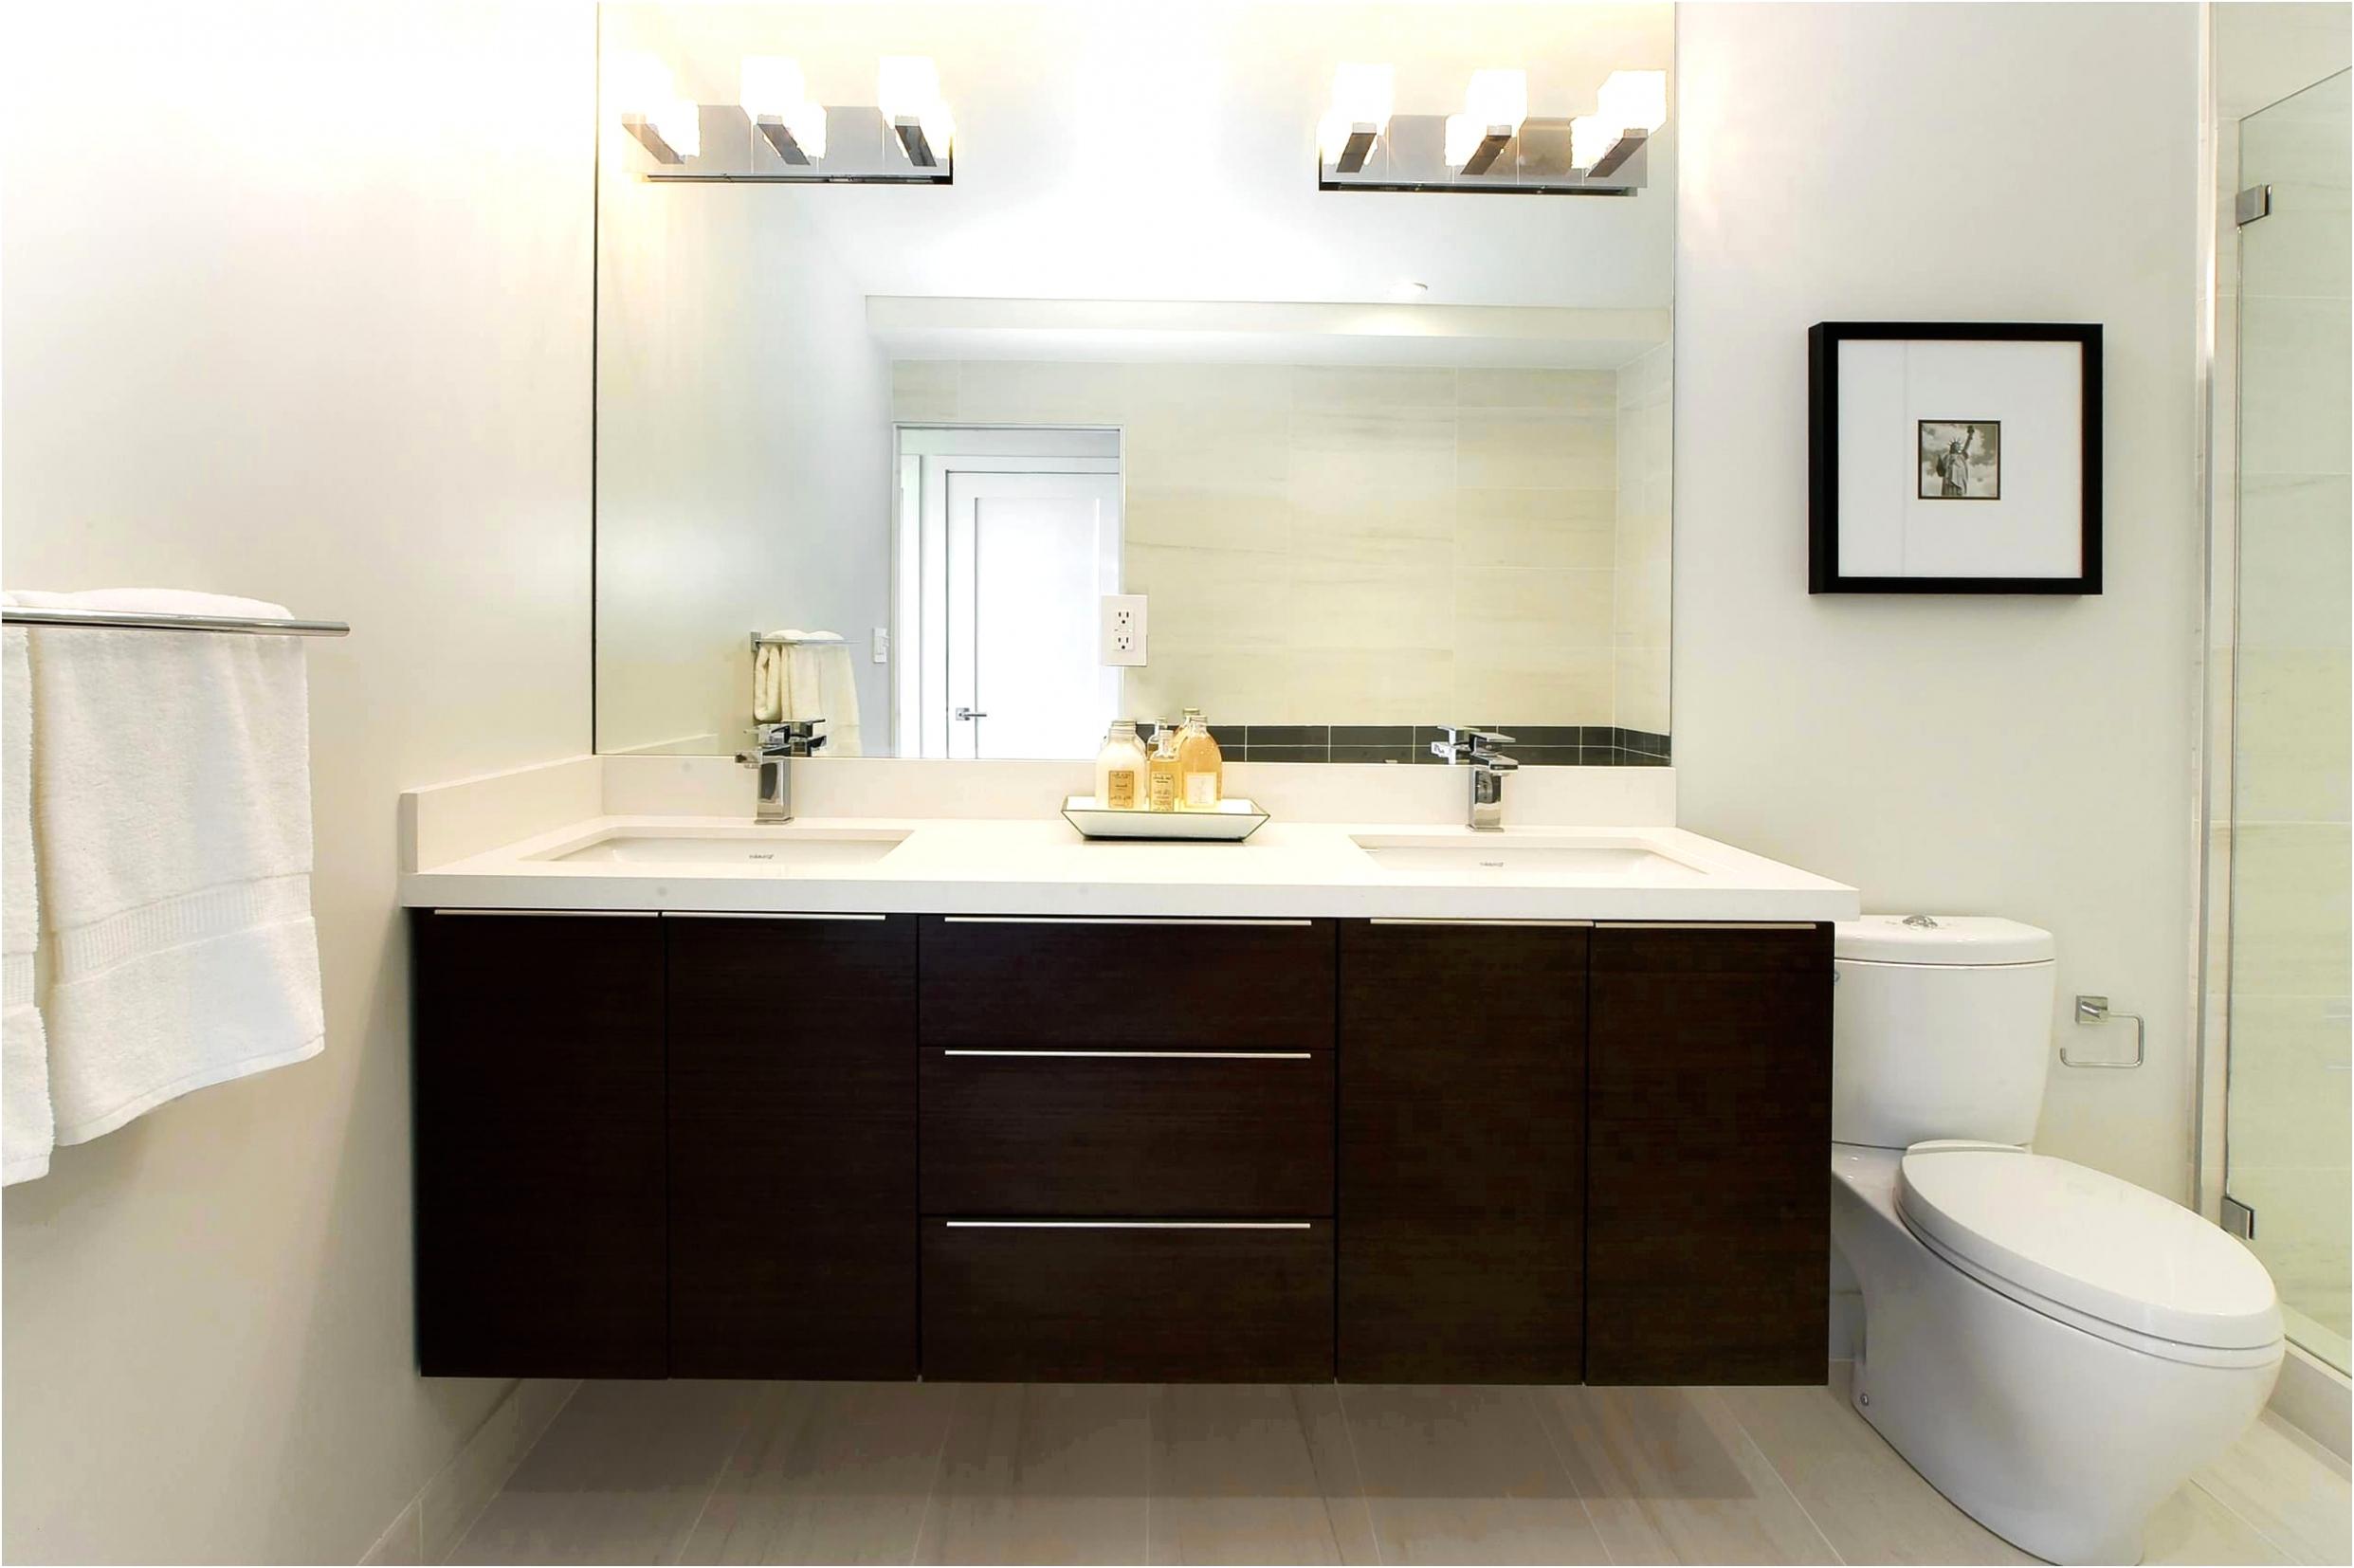 New Home Bathroom Designs Amazing Metal Wall Art Panels Fresh 1 Kirkland Wall Decor Home